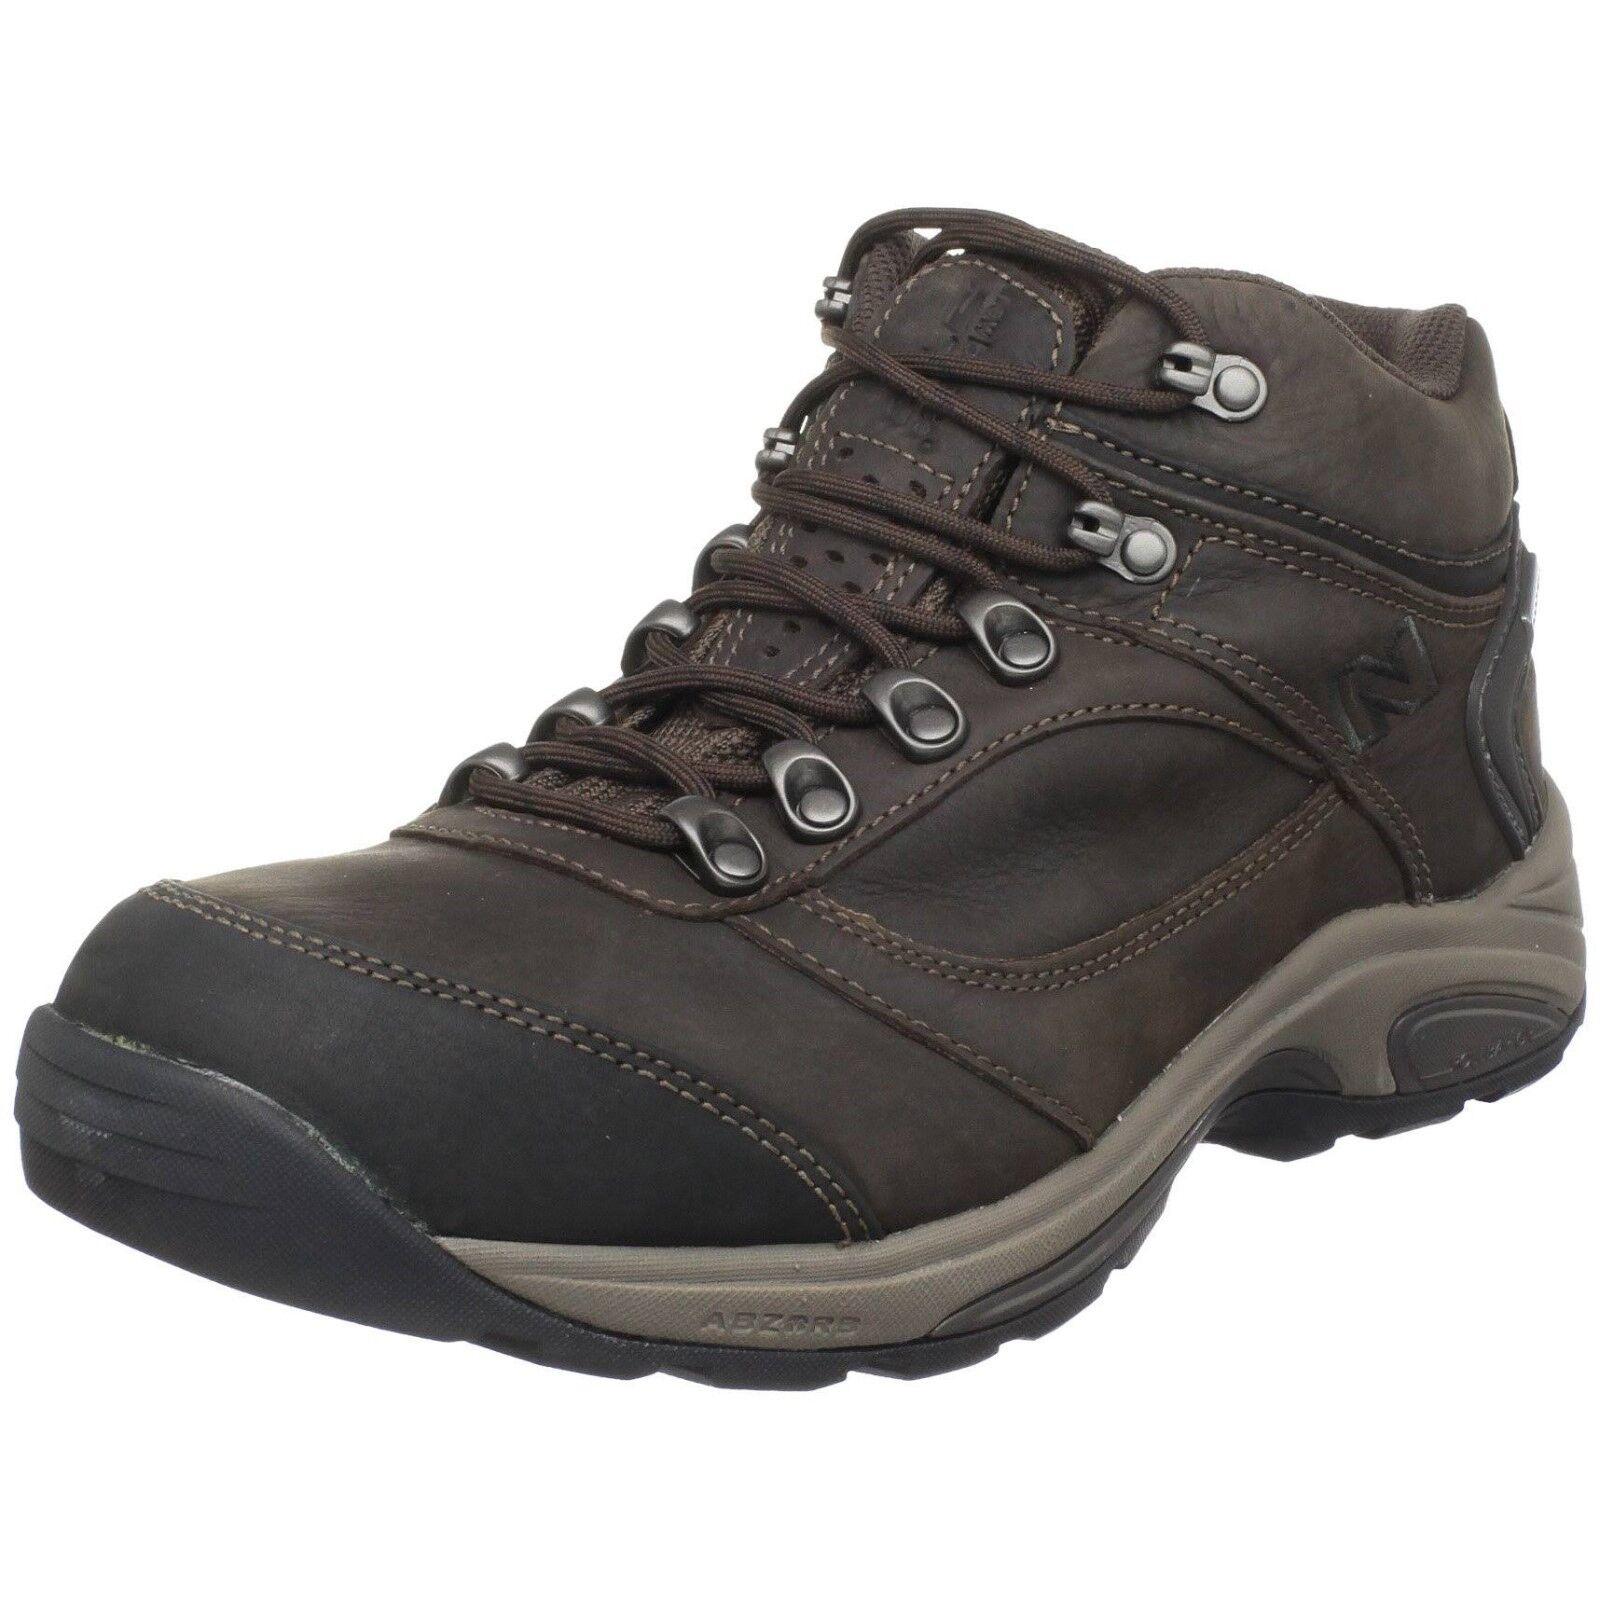 New Balance 978 Men's Trail Walking Shoes Brown